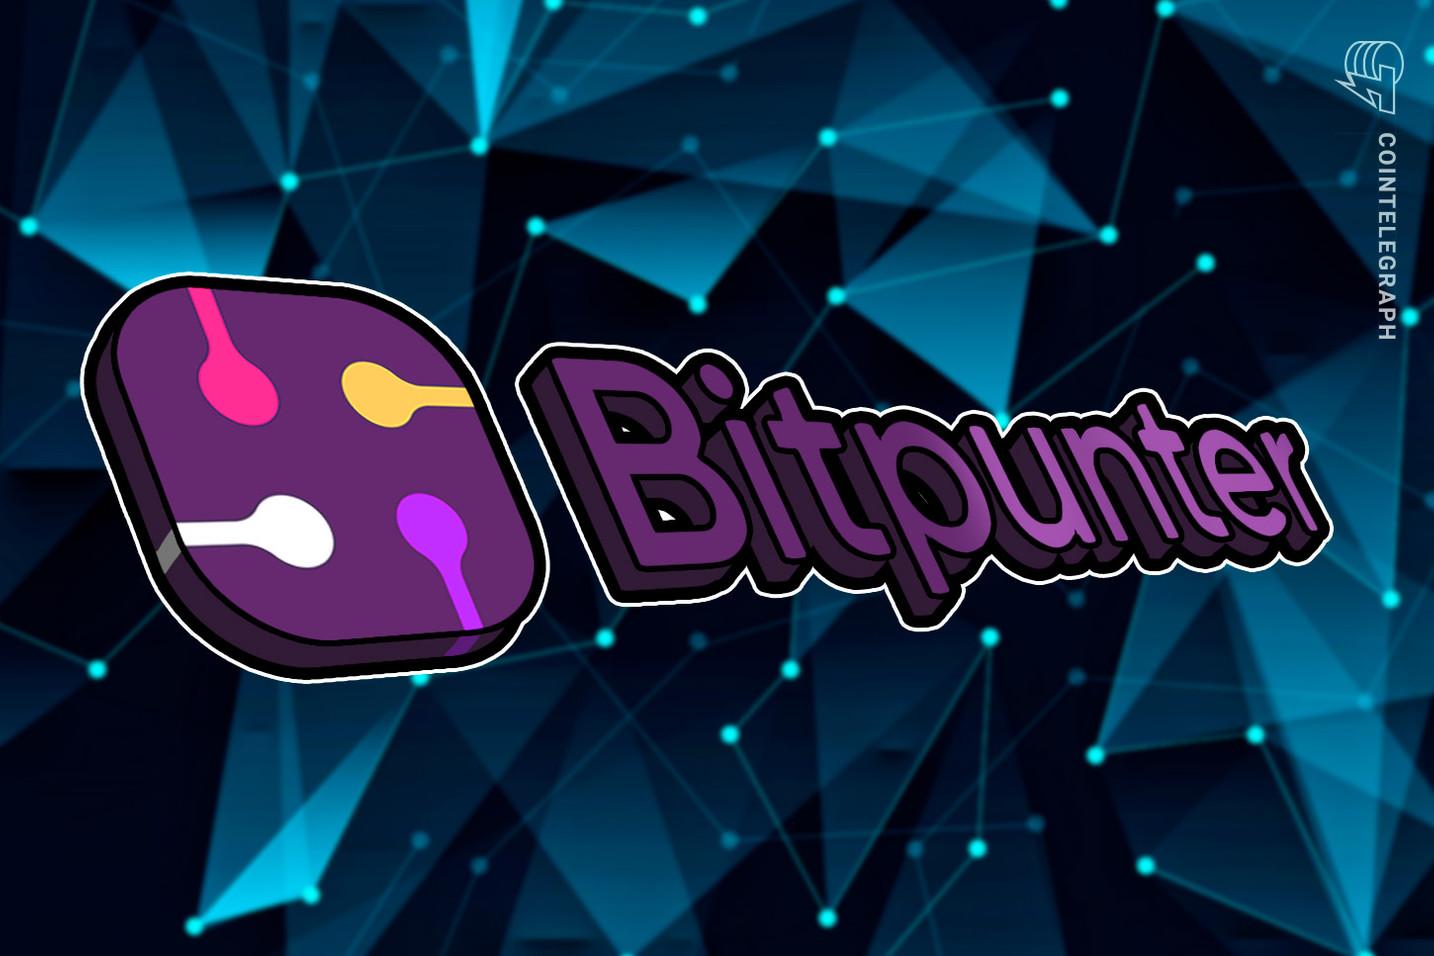 Application of Transaction Mining in Online Gaming: Bitpunter